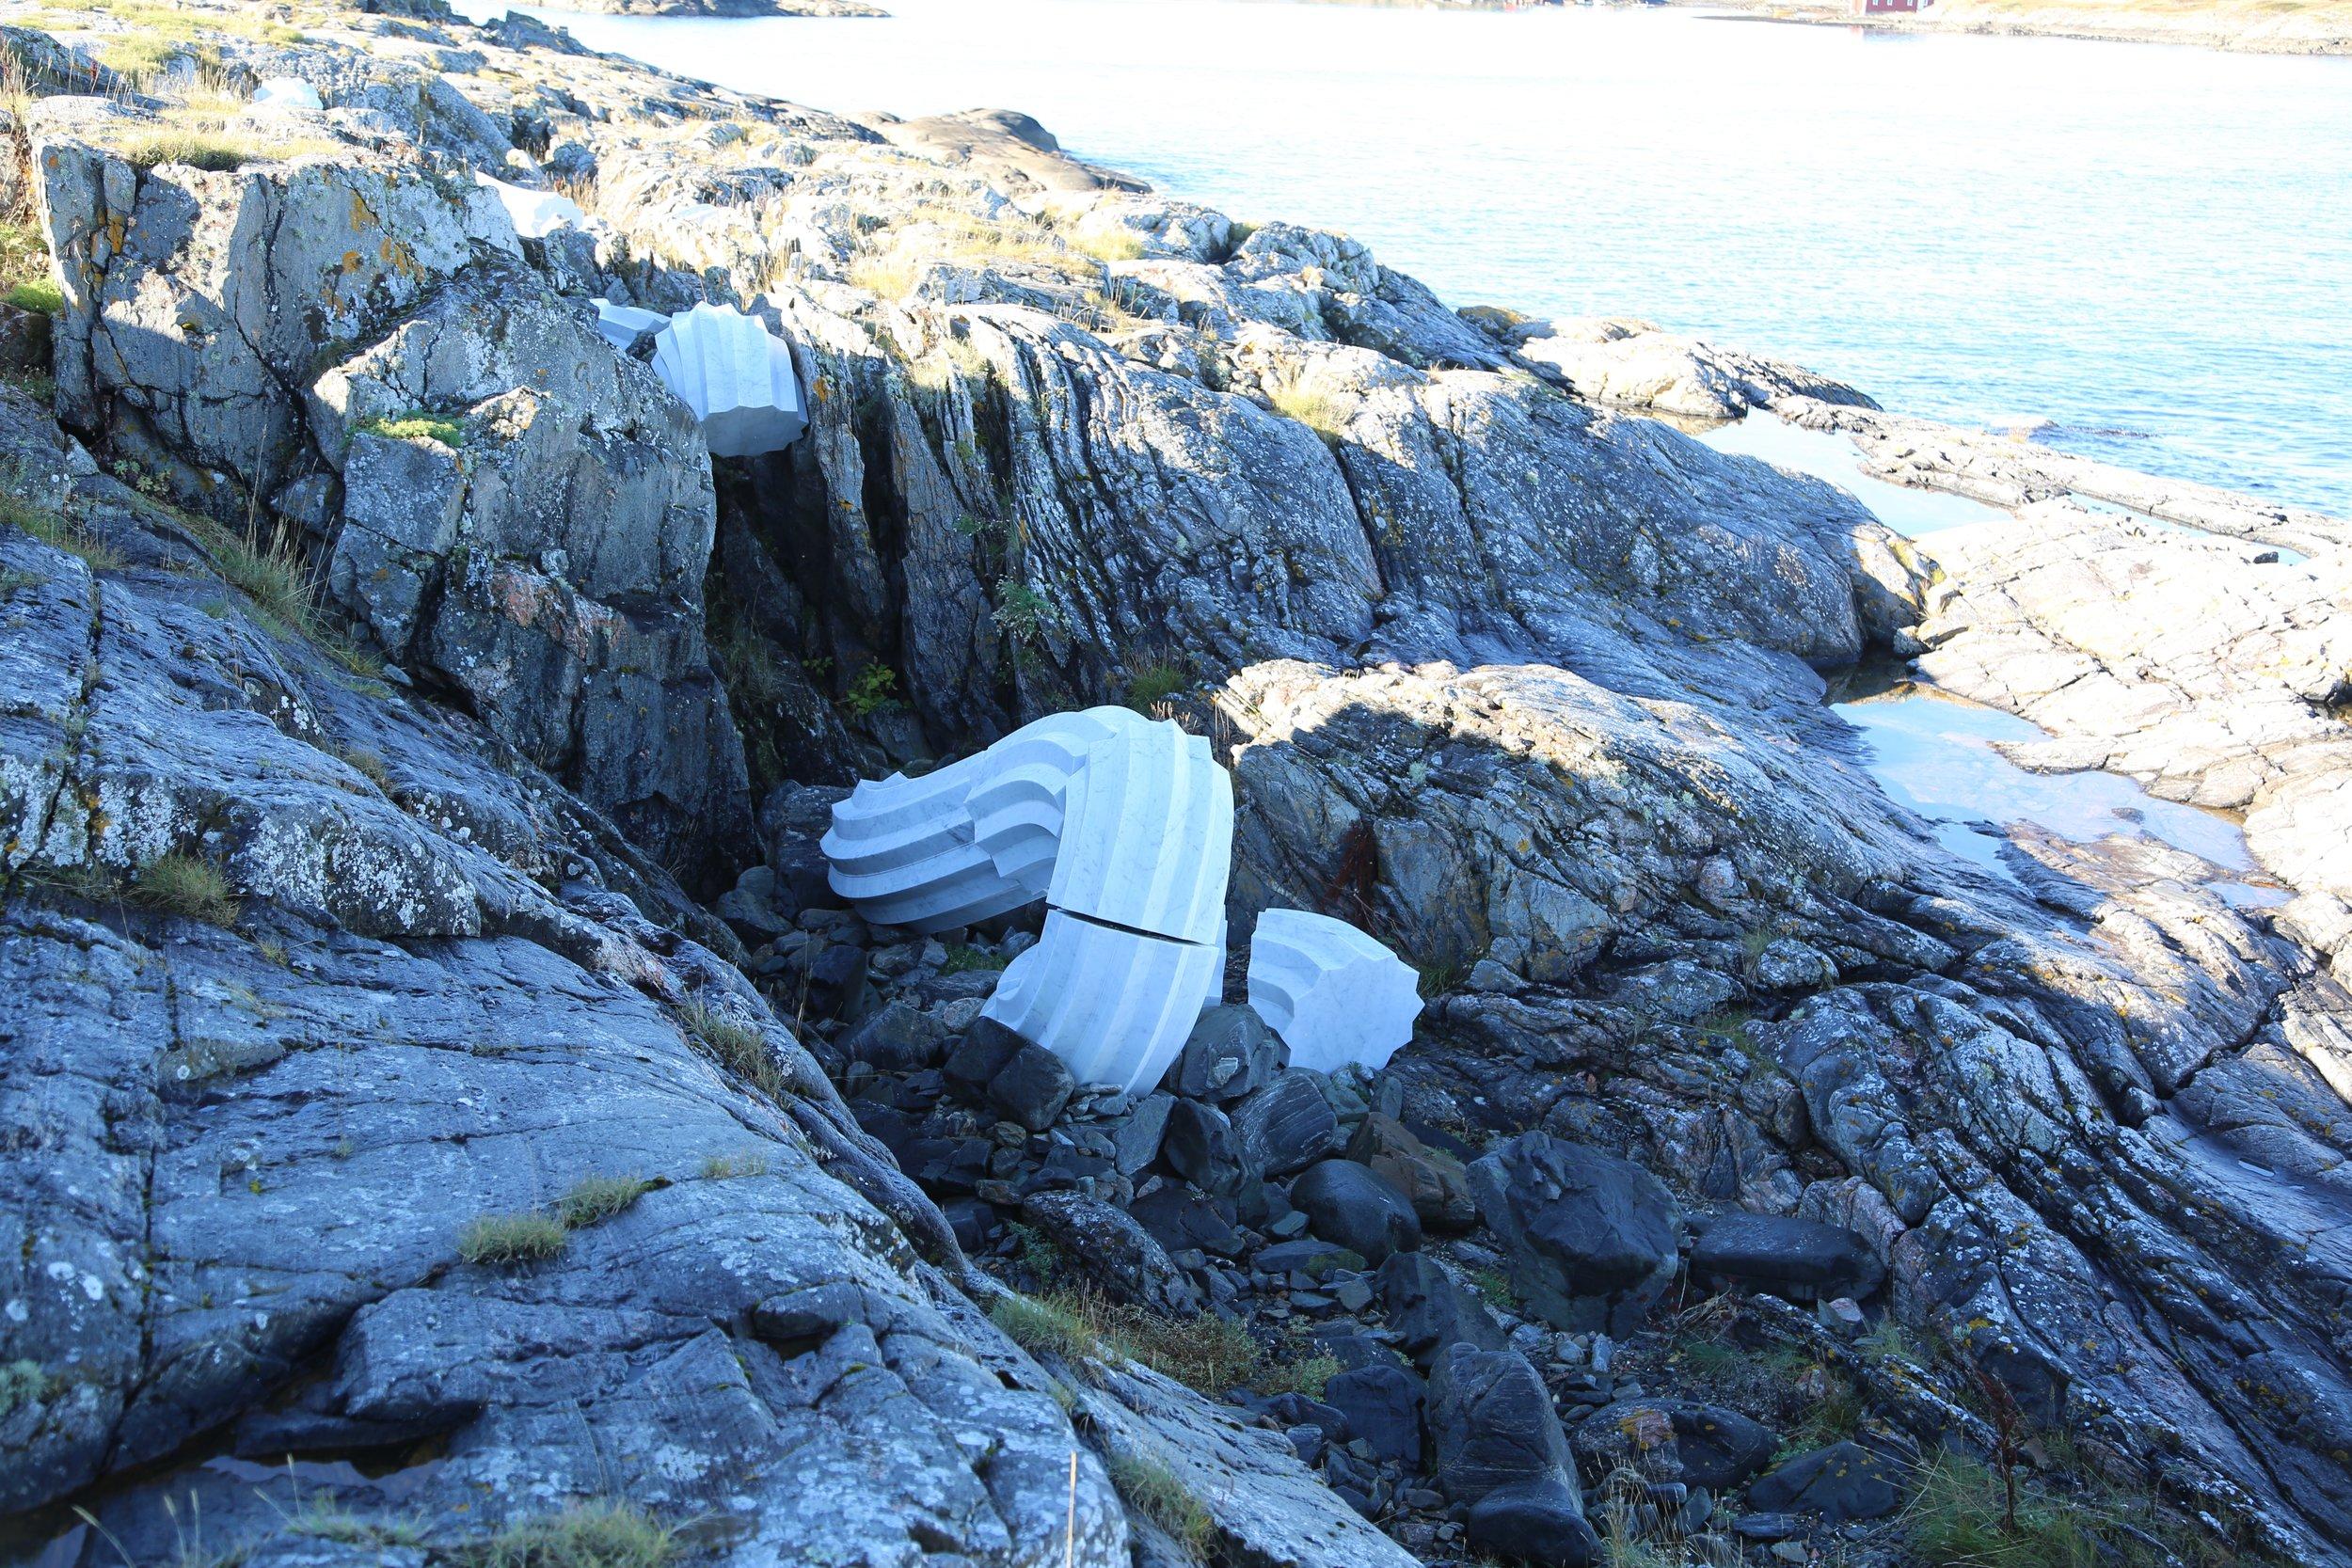 Italiensk marmor i fjæra.                            Foto: Odd Roar Lange